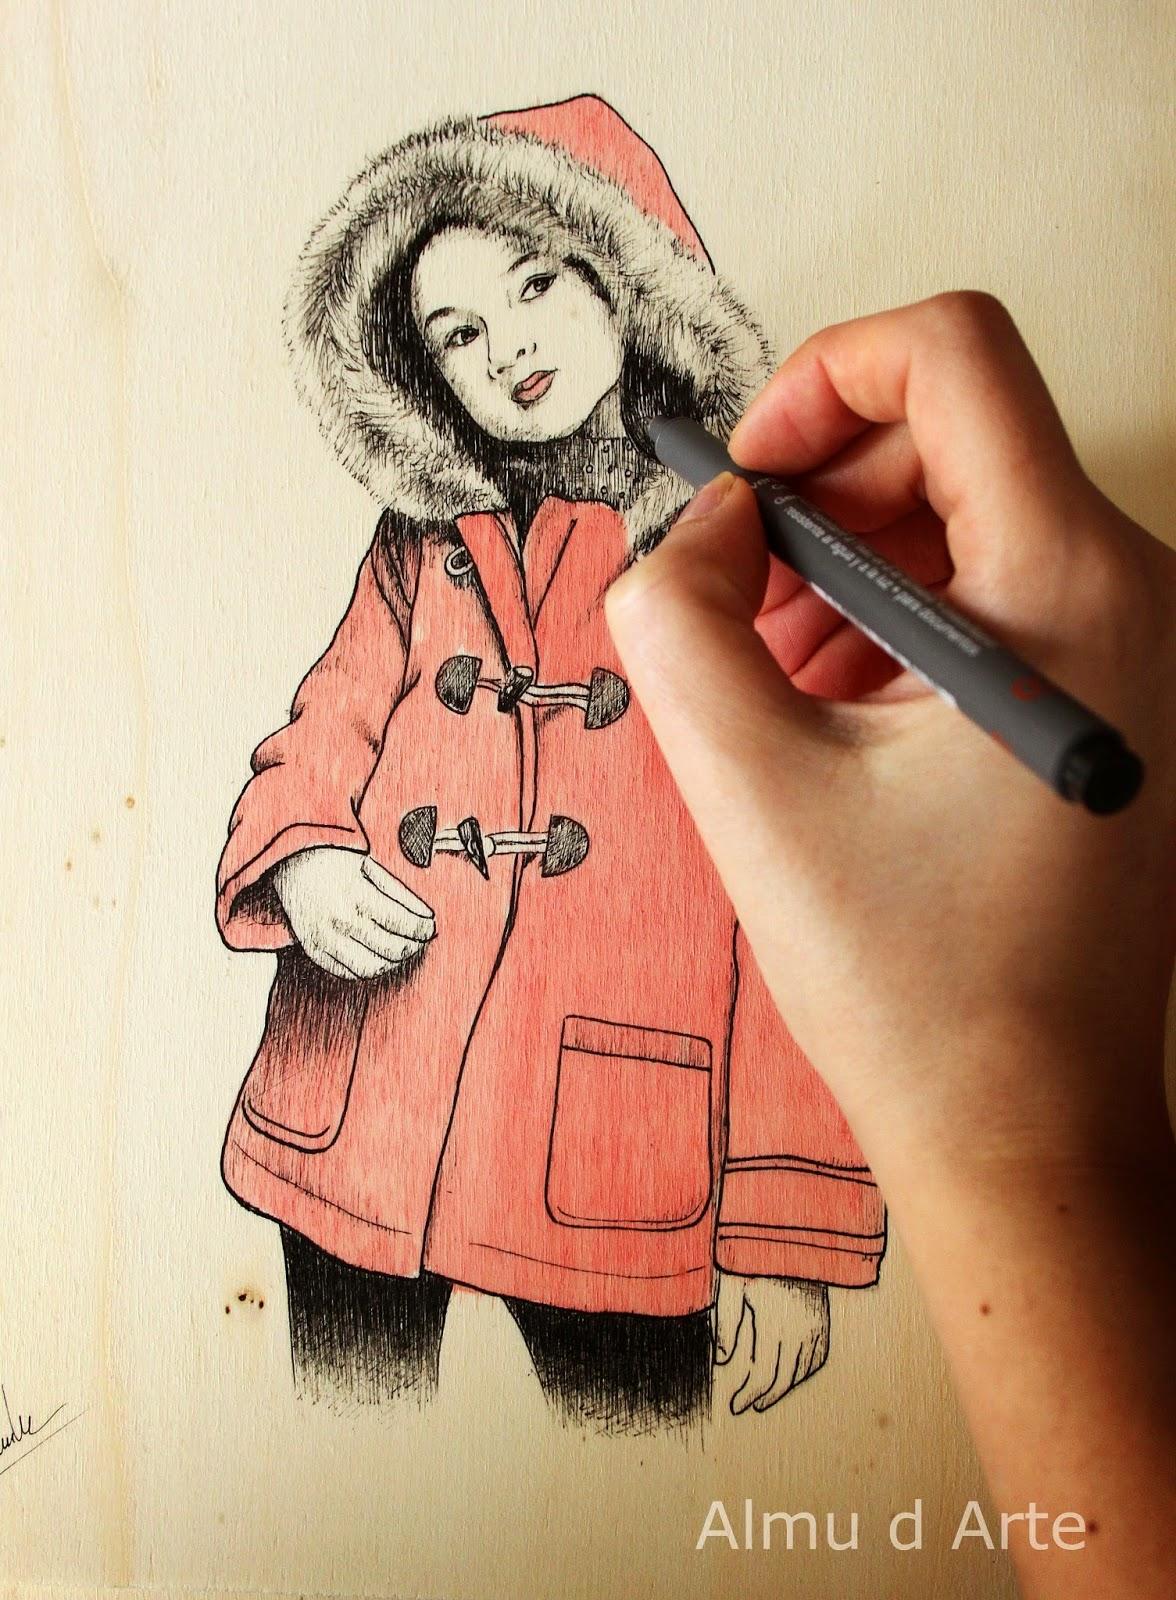 Retrato de niña con tinta y acuarela